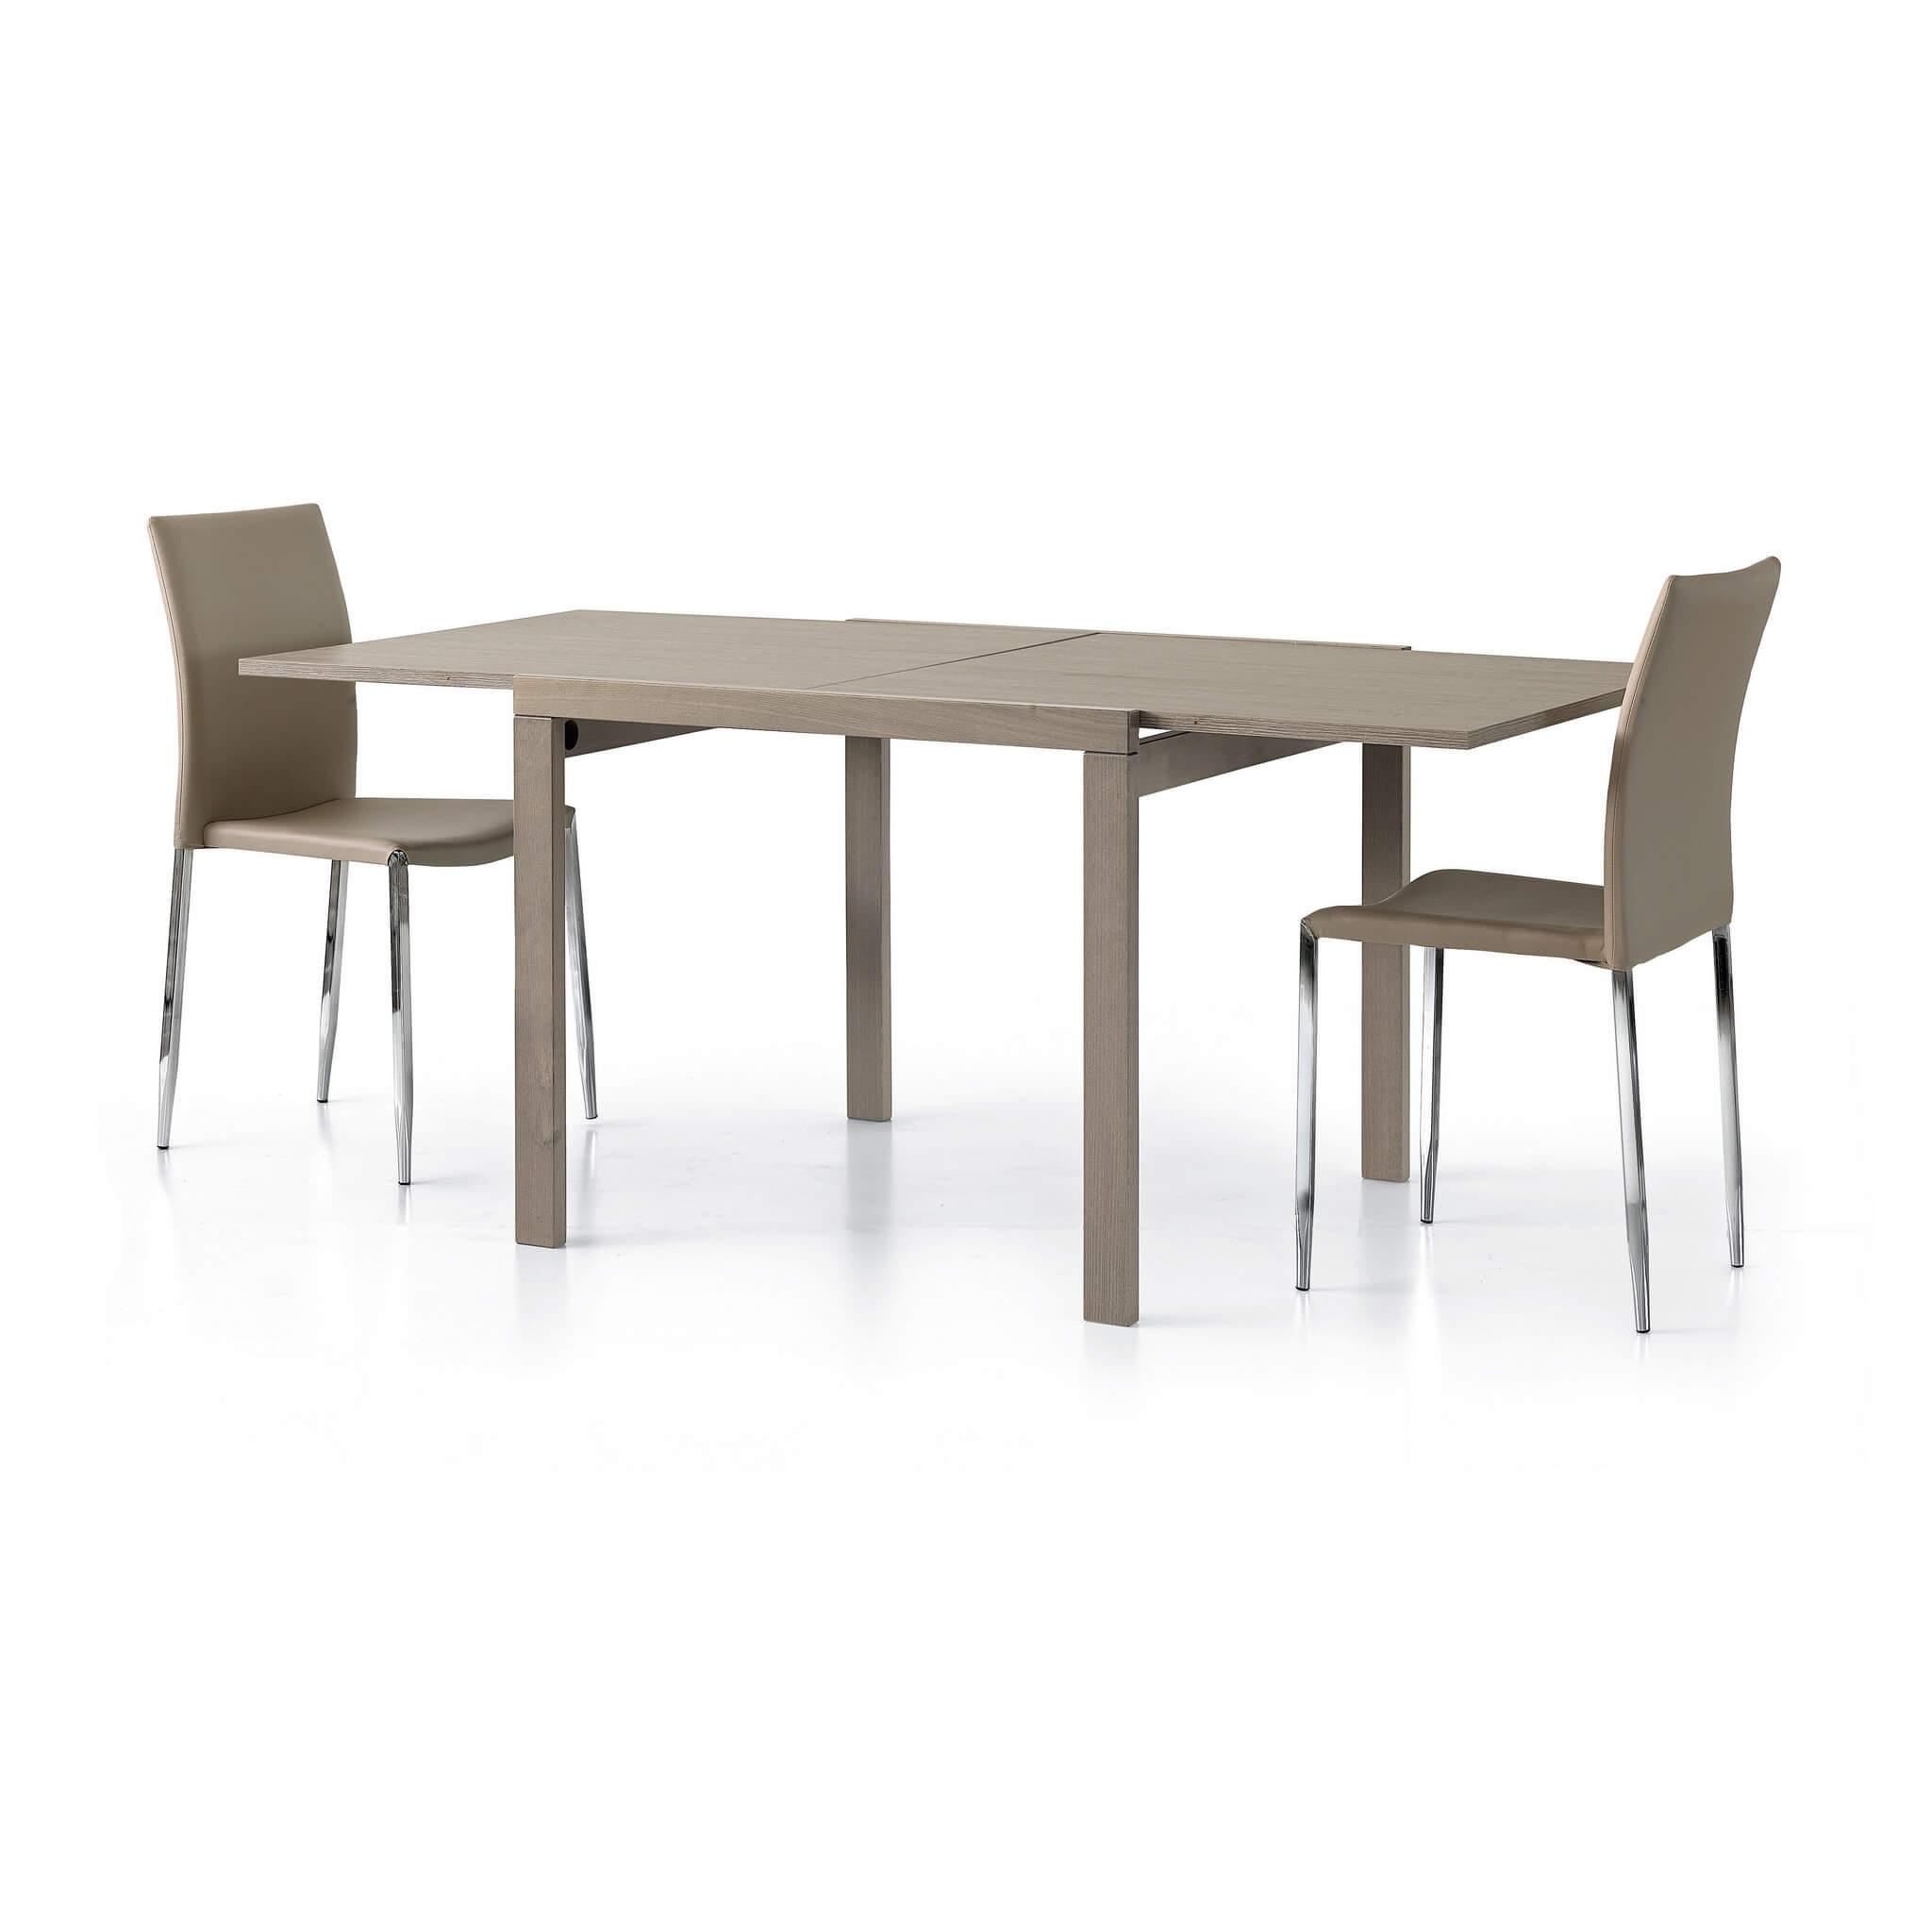 milani home meyer - tavolo da pranzo moderno allungabile a libro 90 x 90/180